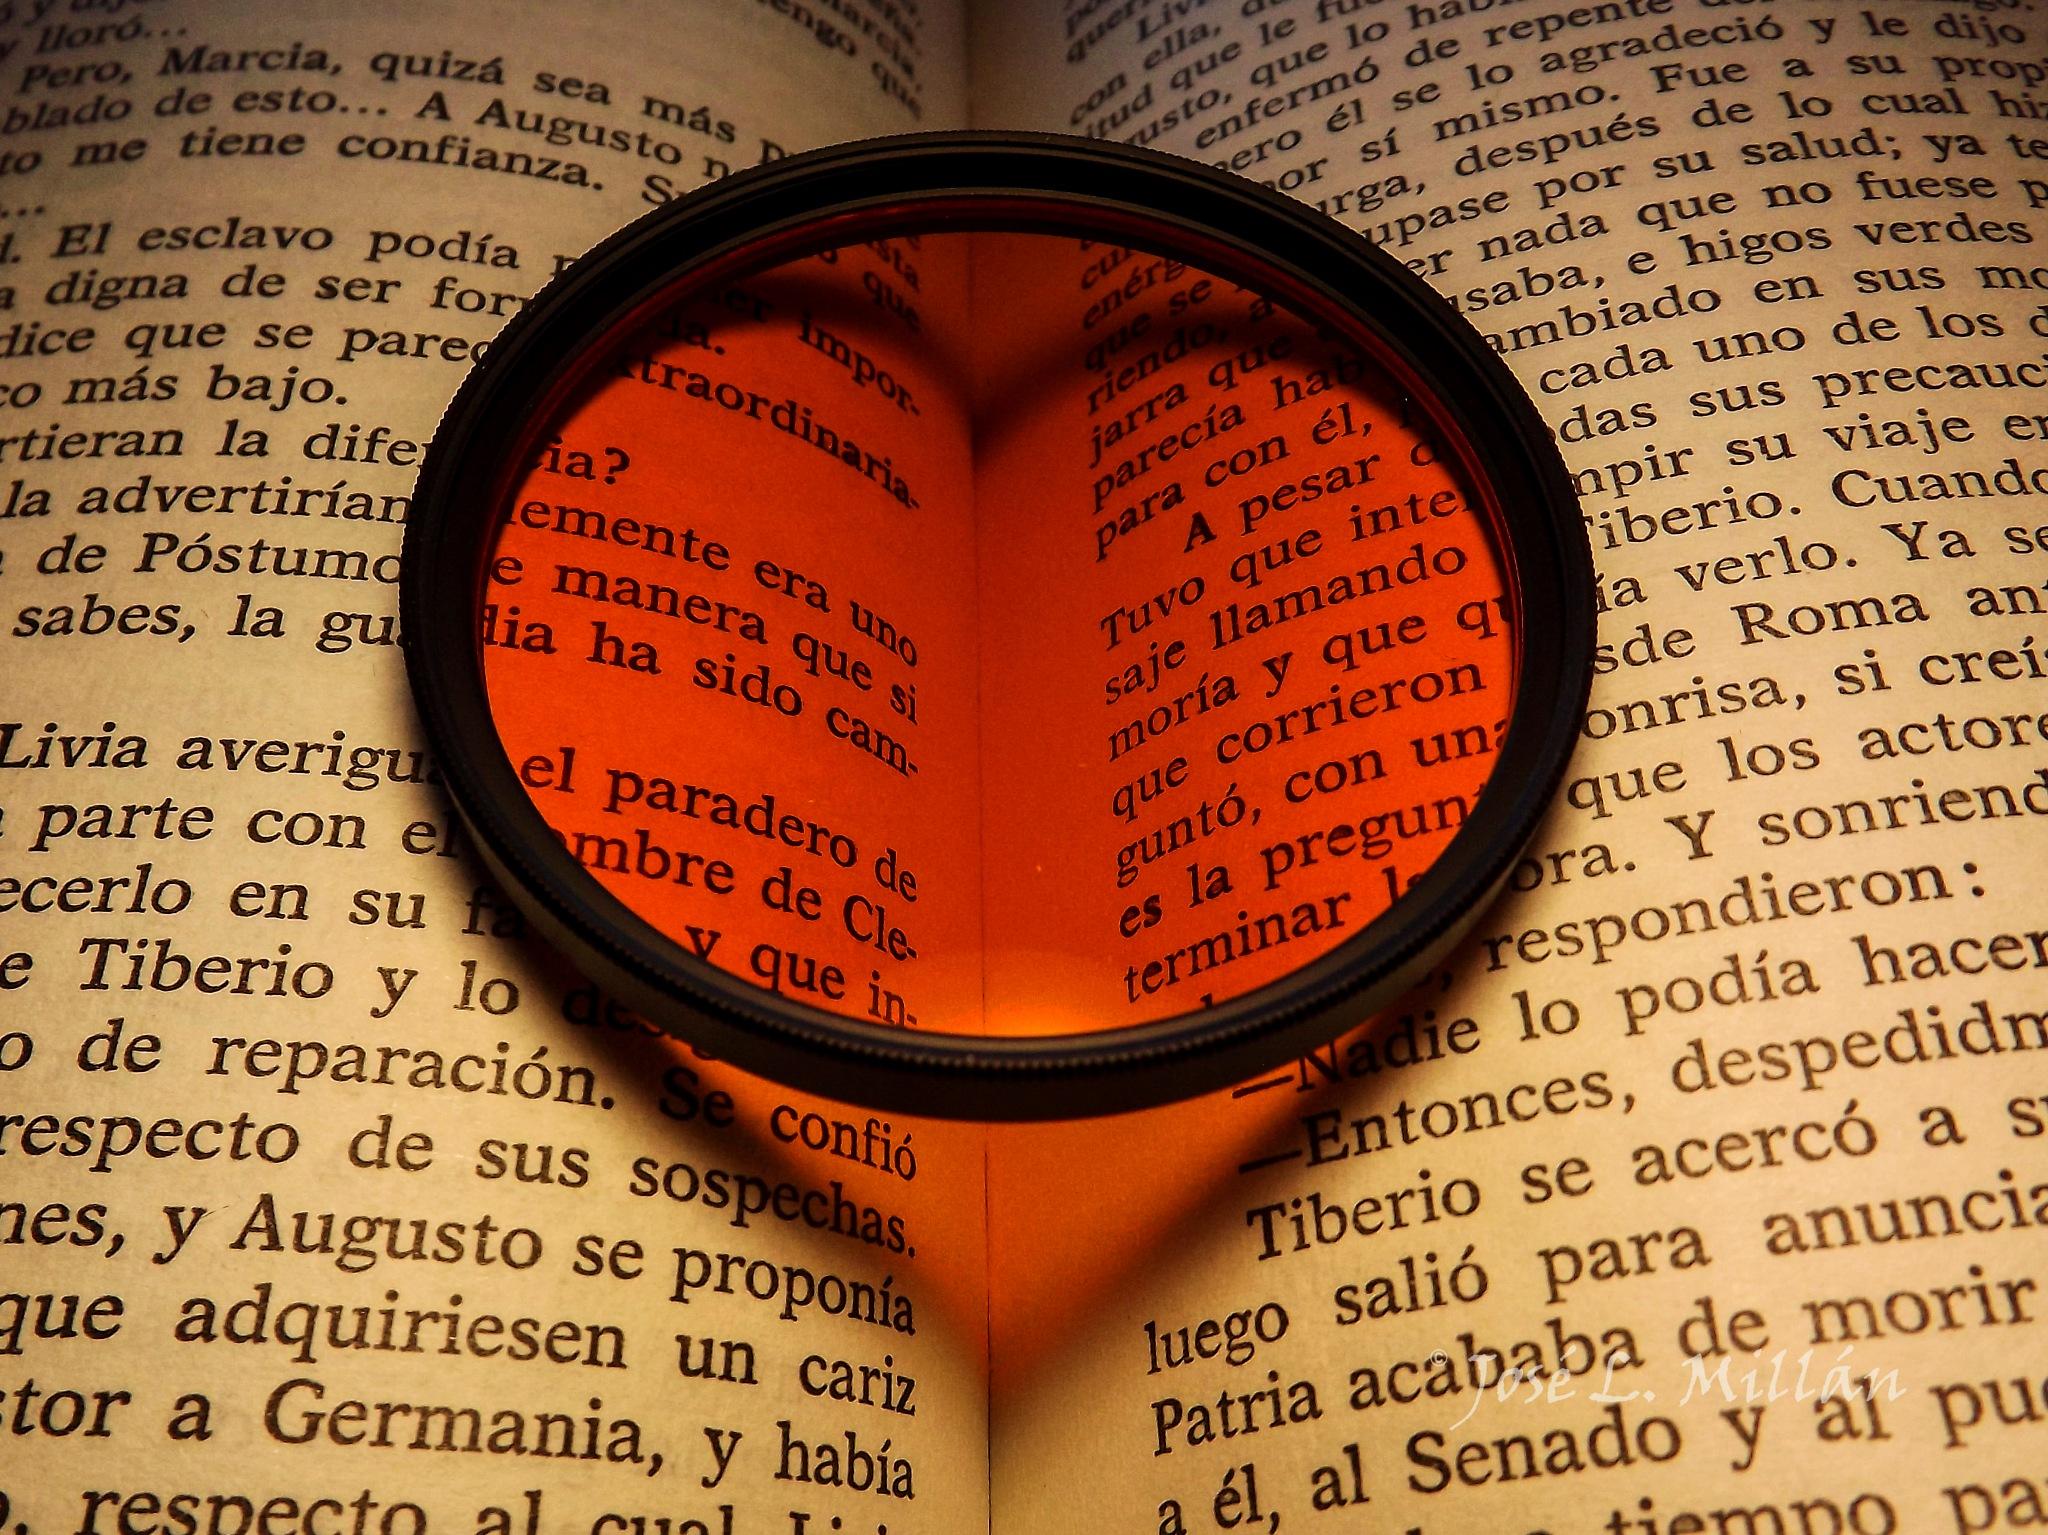 Amor a los Libros  by JlmmPhotos